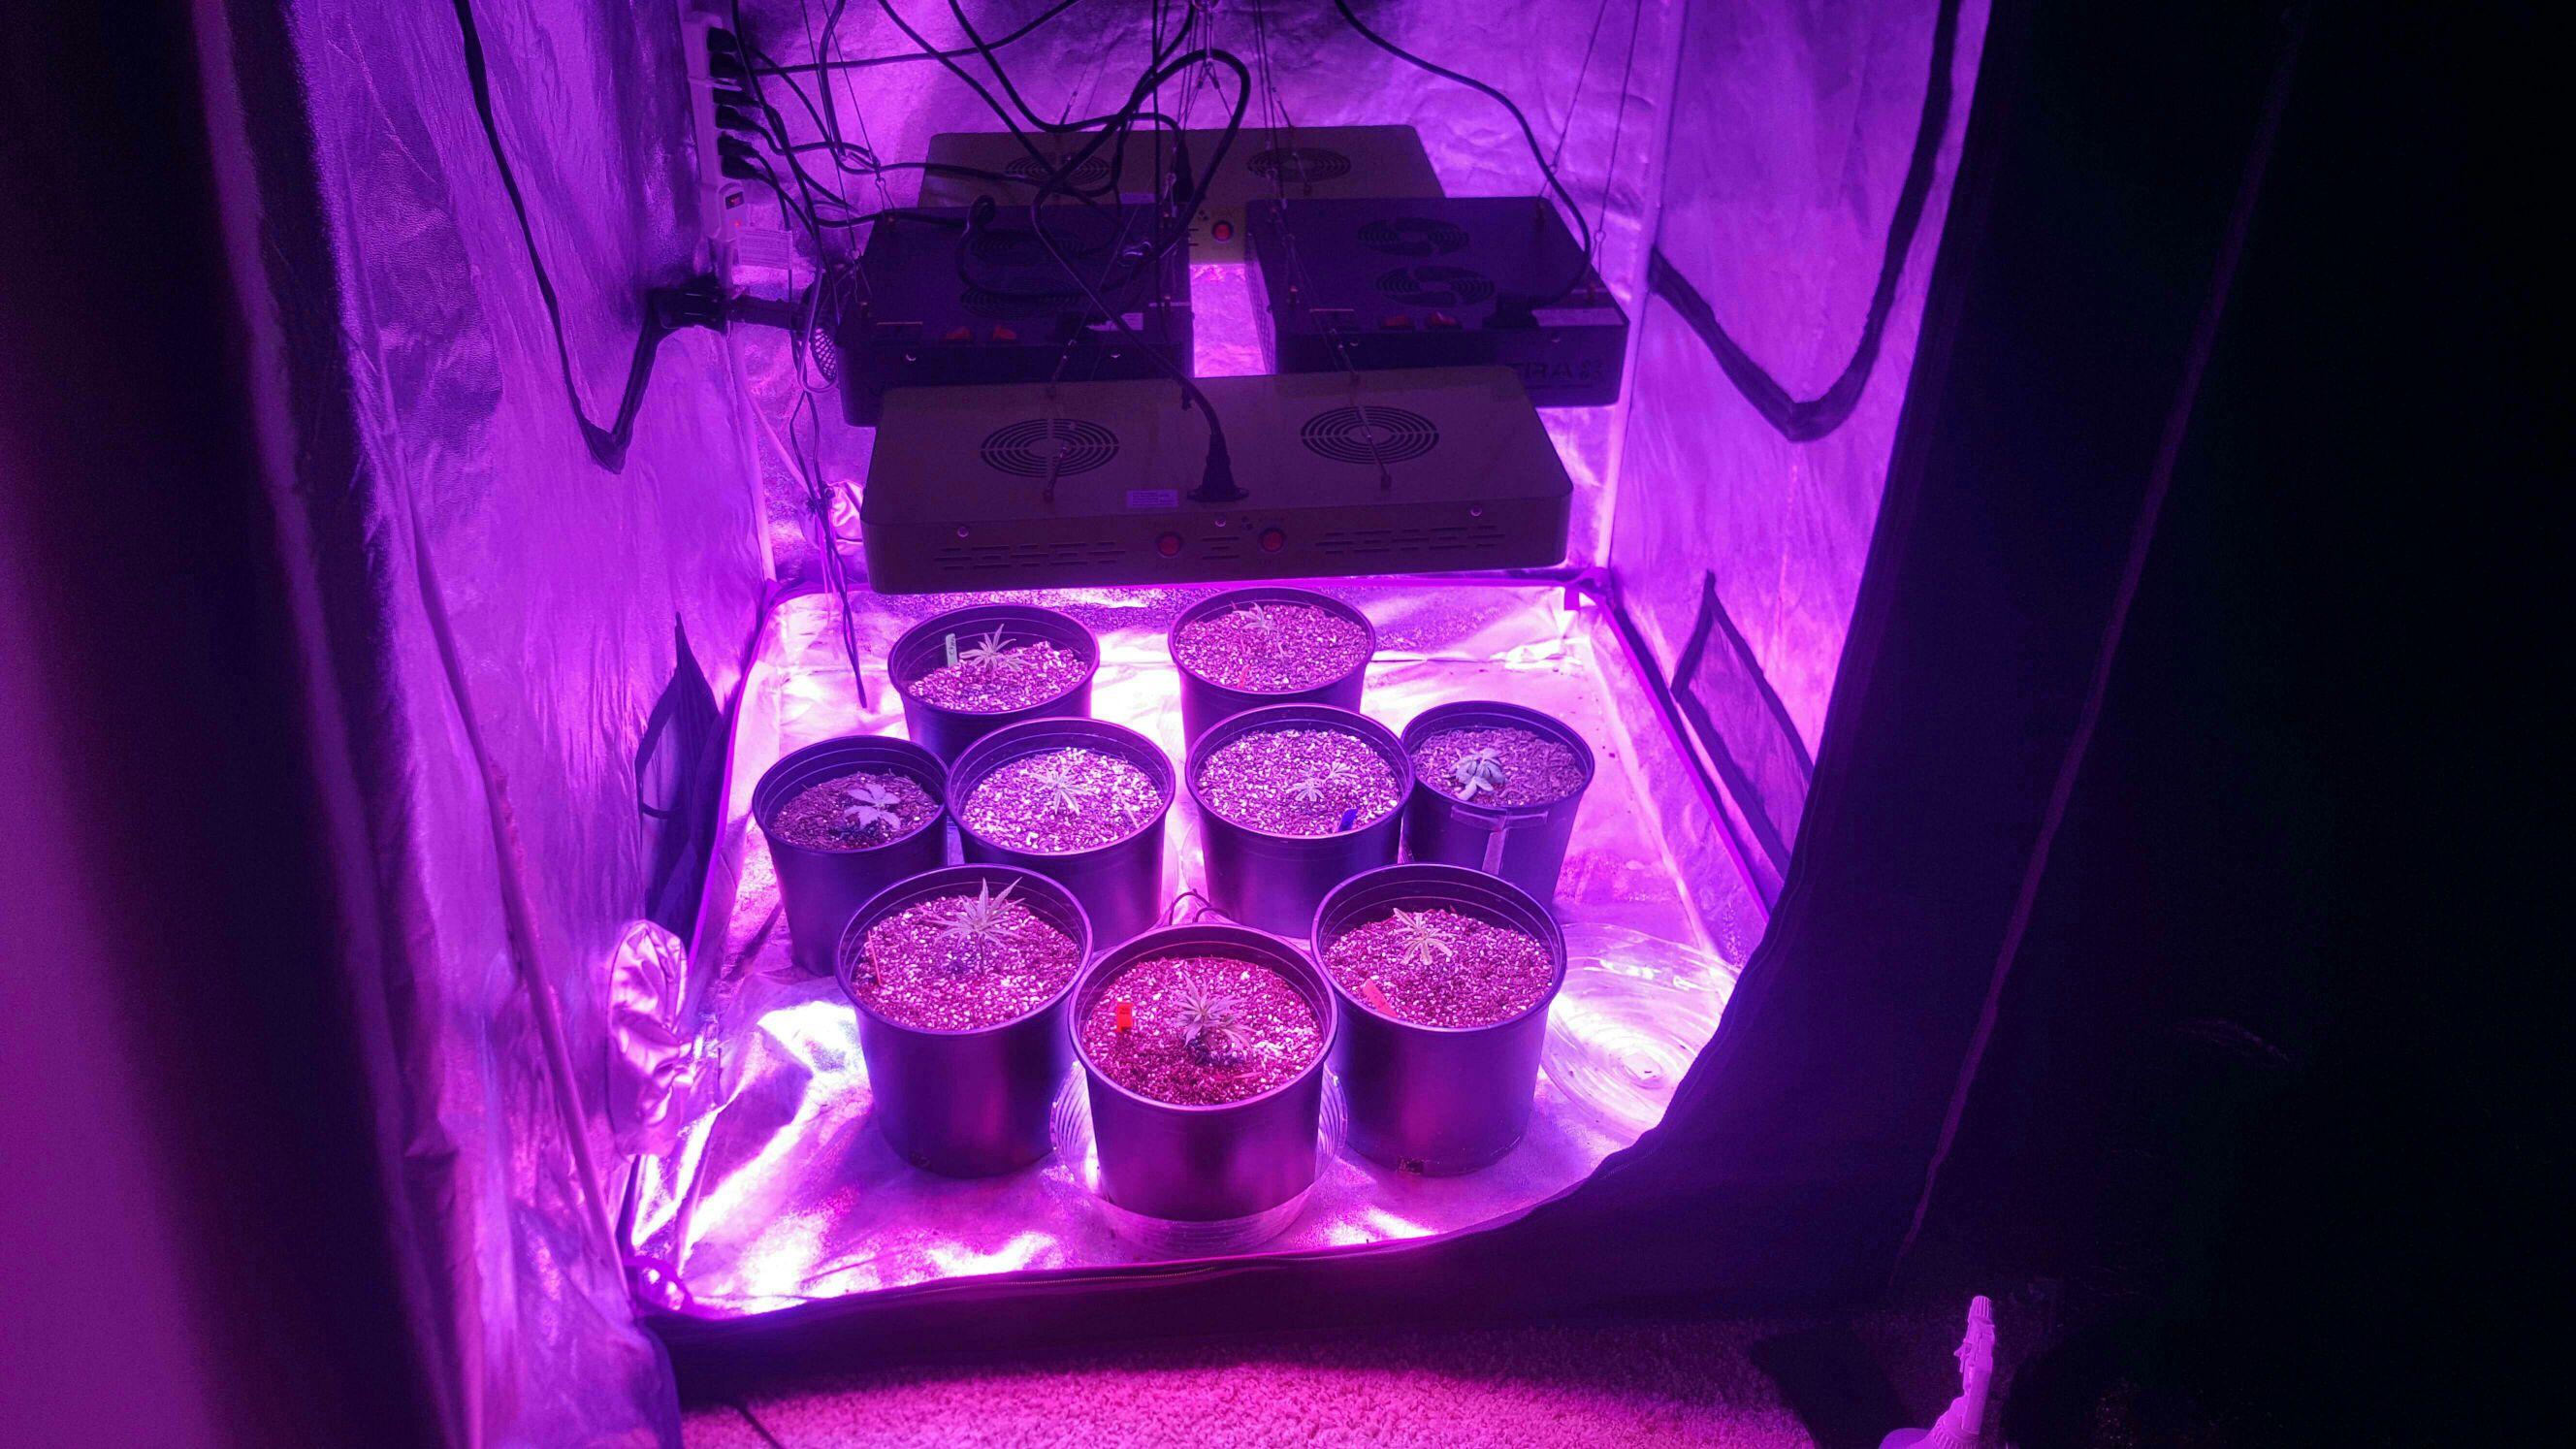 low priced 5daa7 6b78a 4x 600 watt led multi-strain grow | Grasscity Forums - The ...